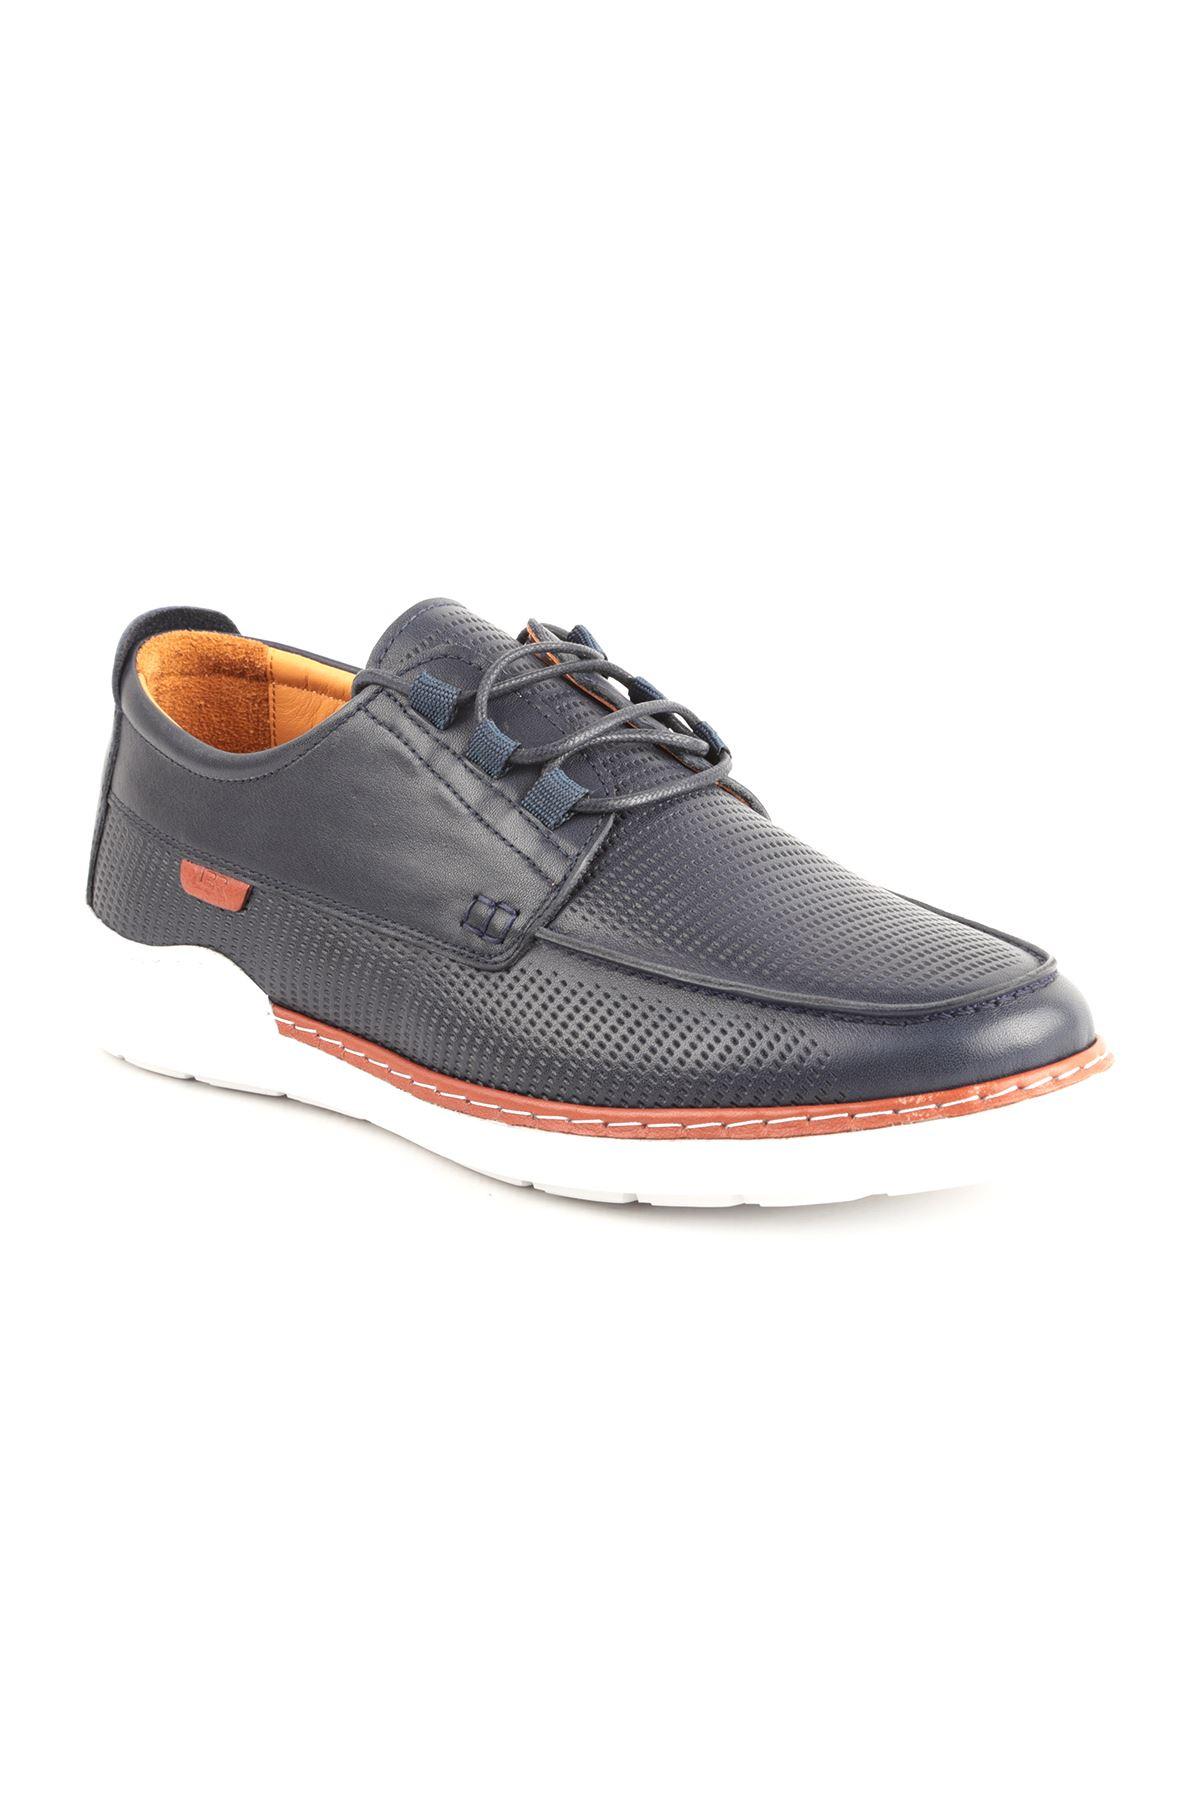 Libero L3629 Lacivert Loafer Ayakkabı